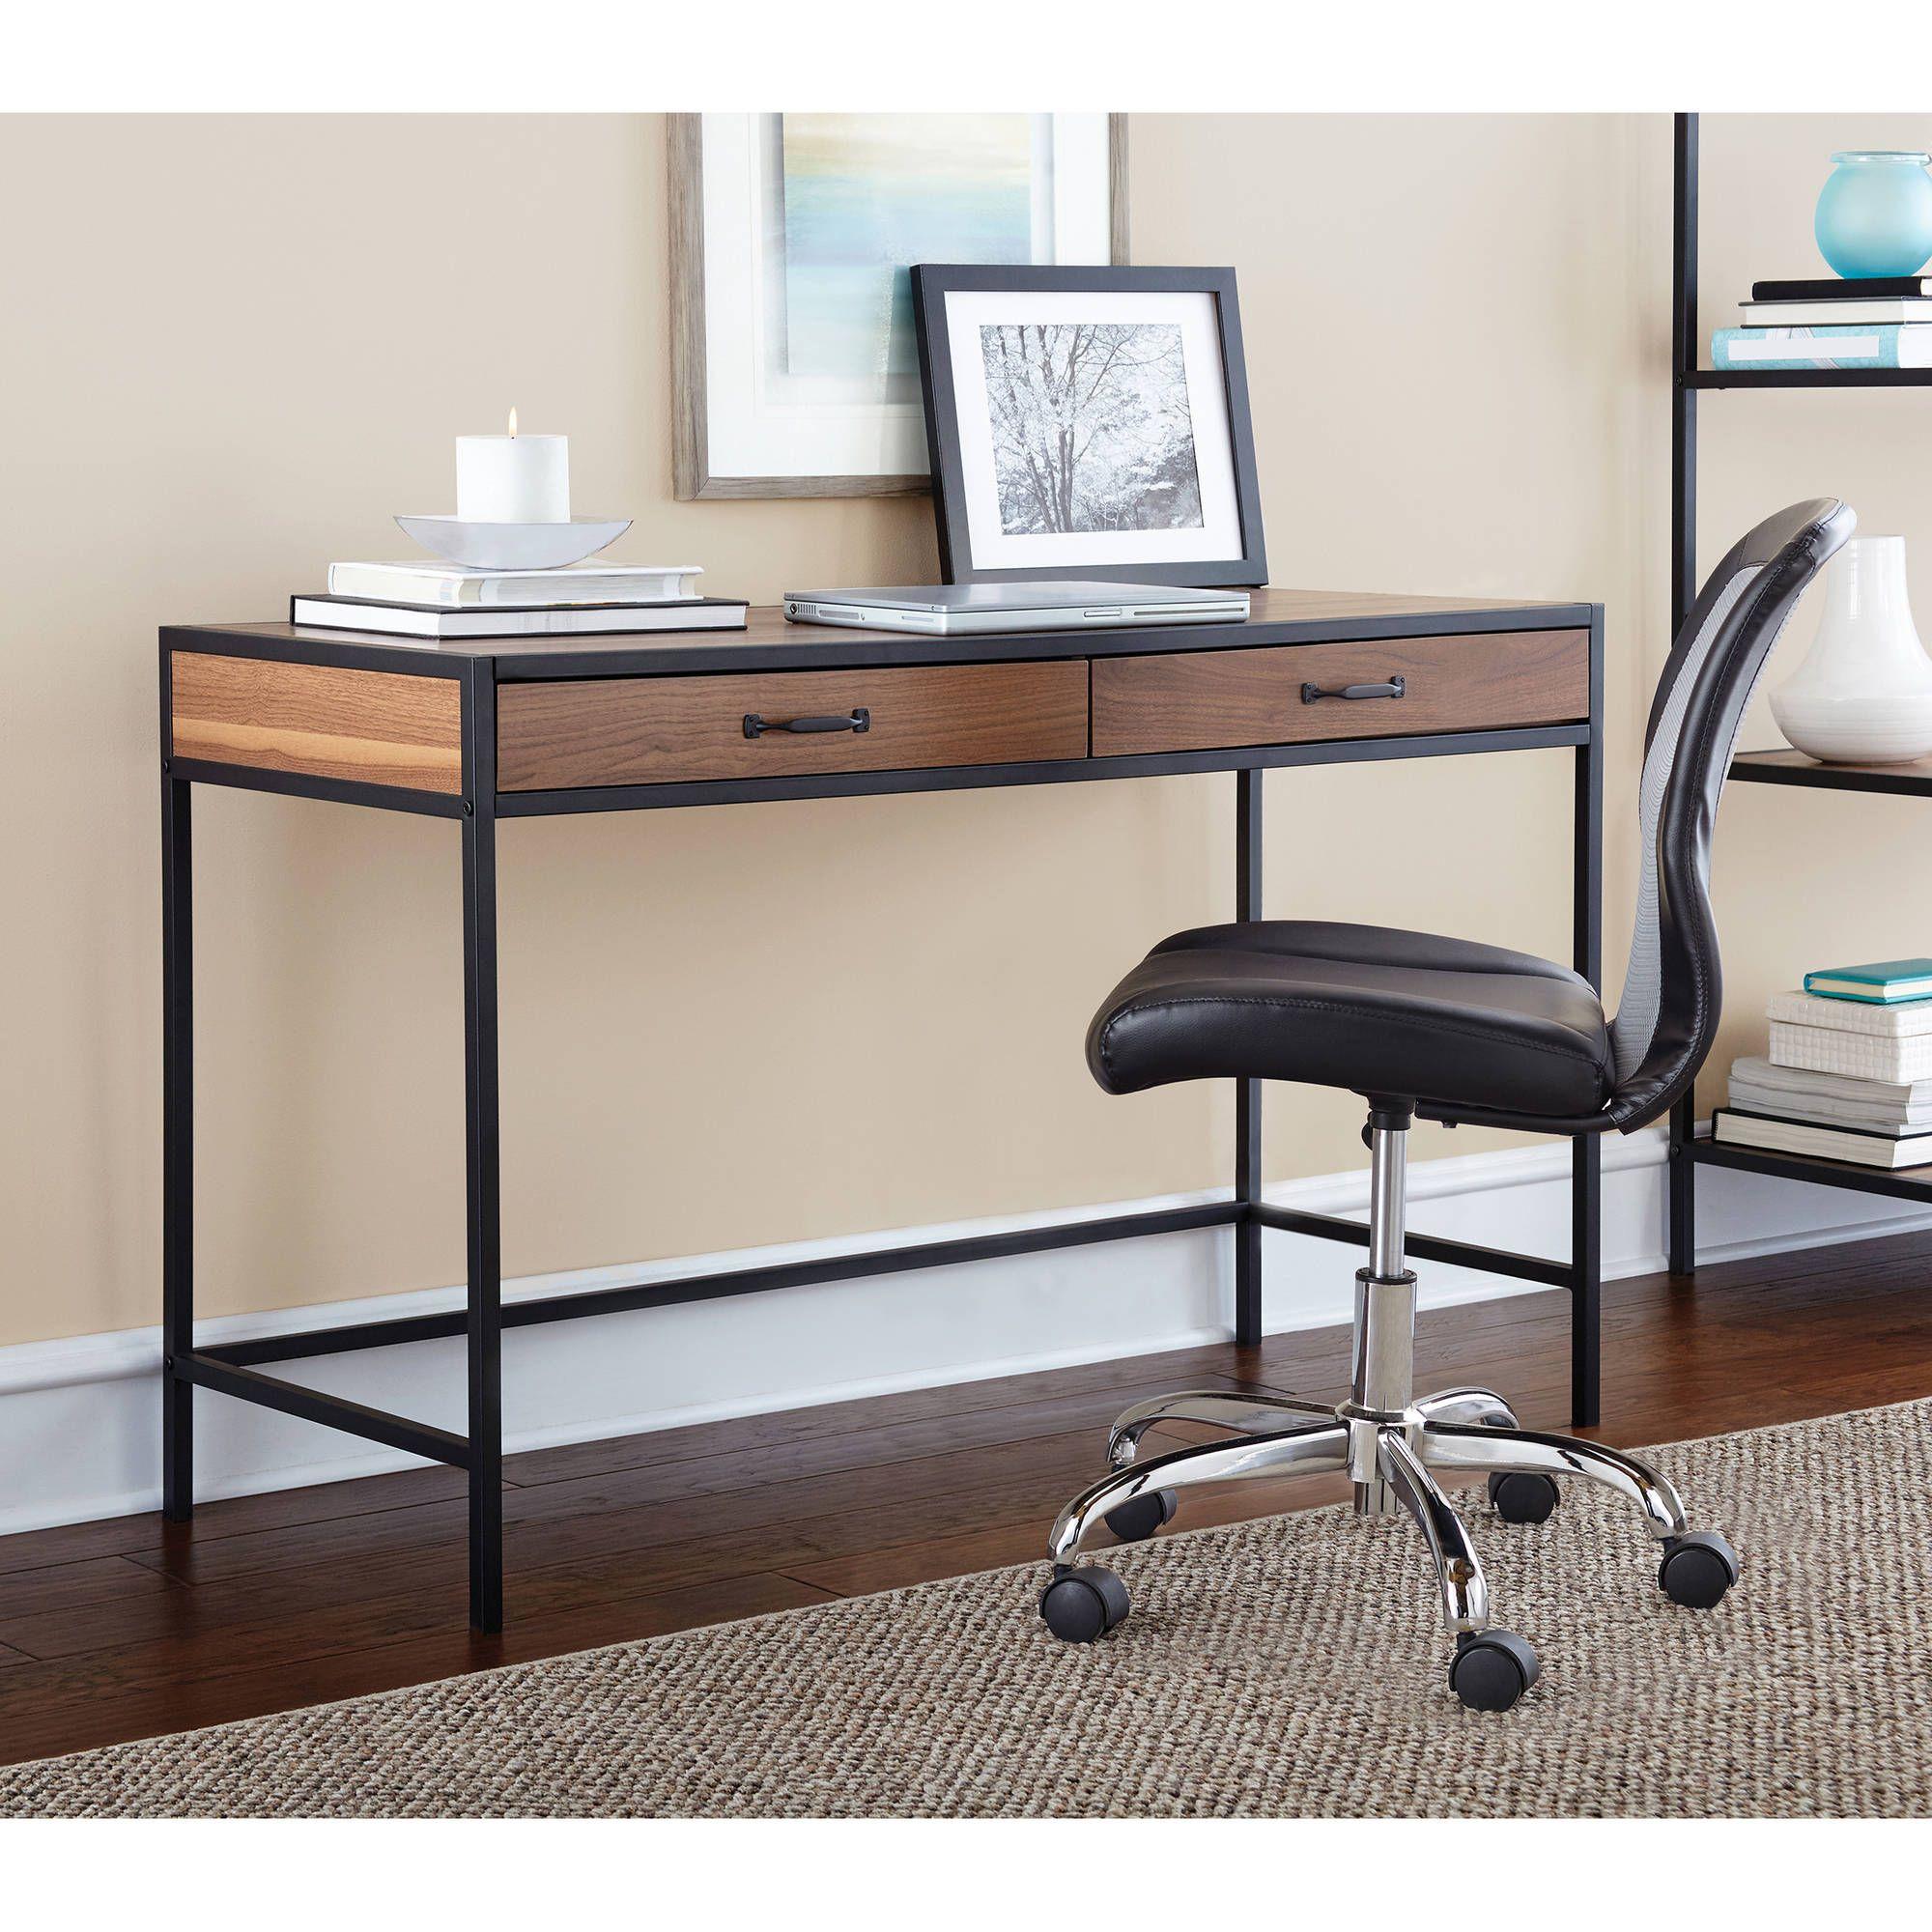 Mainstays Metro Desk Warm Ash Finish Home Office Furniture Office Furniture Desk Sleek Desk